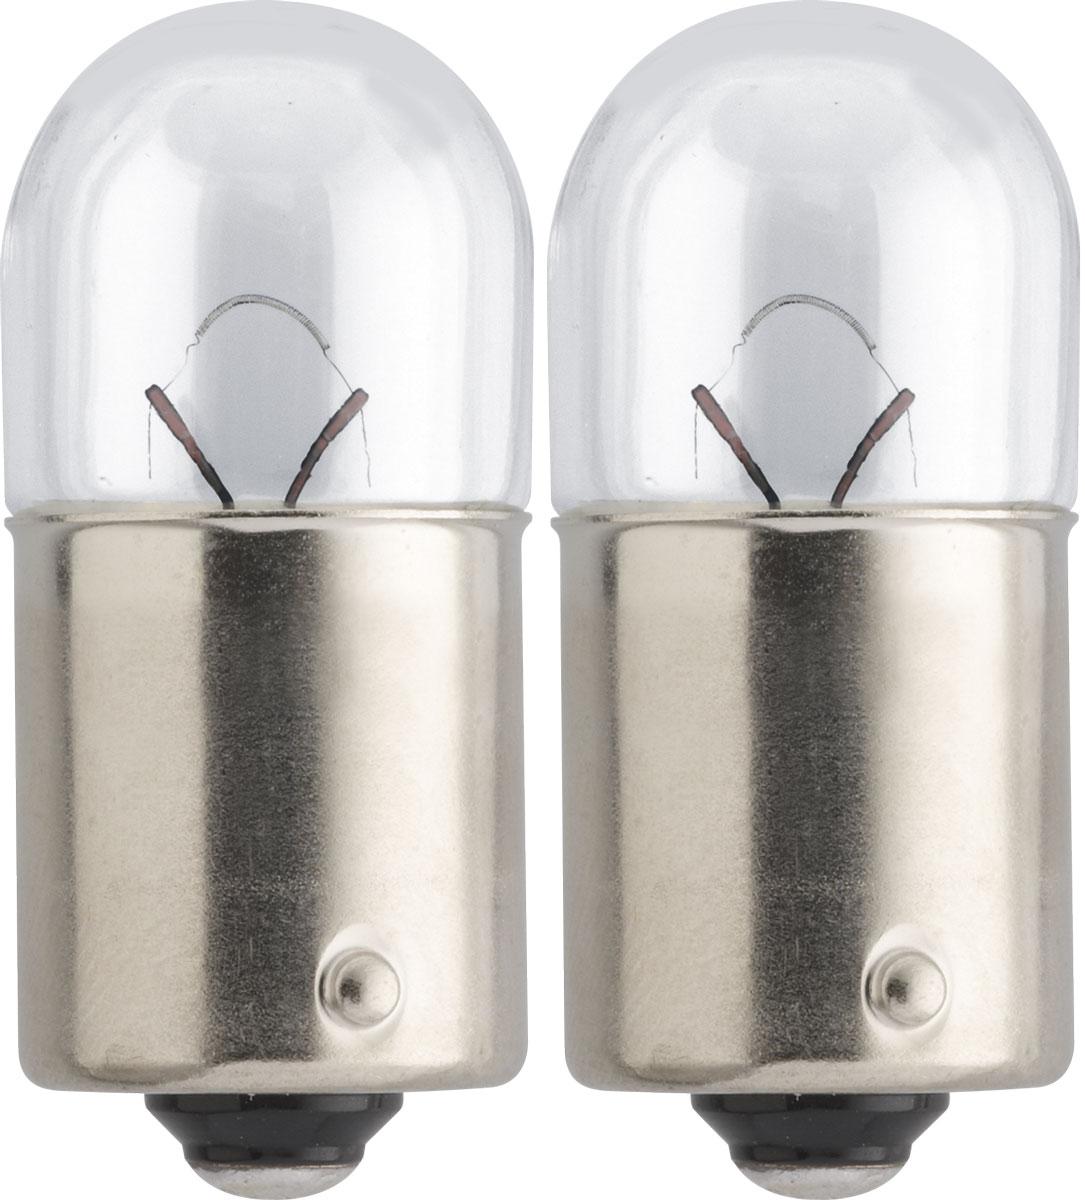 Сигнальная автомобильная лампа Philips Long Life EcoVision увелич. срок службы R5W 12V-5W (BA15s) (2шт.) 12821LLECOB2 автомобильная лампа h4 60 55w longlife ecovision 2 шт philips